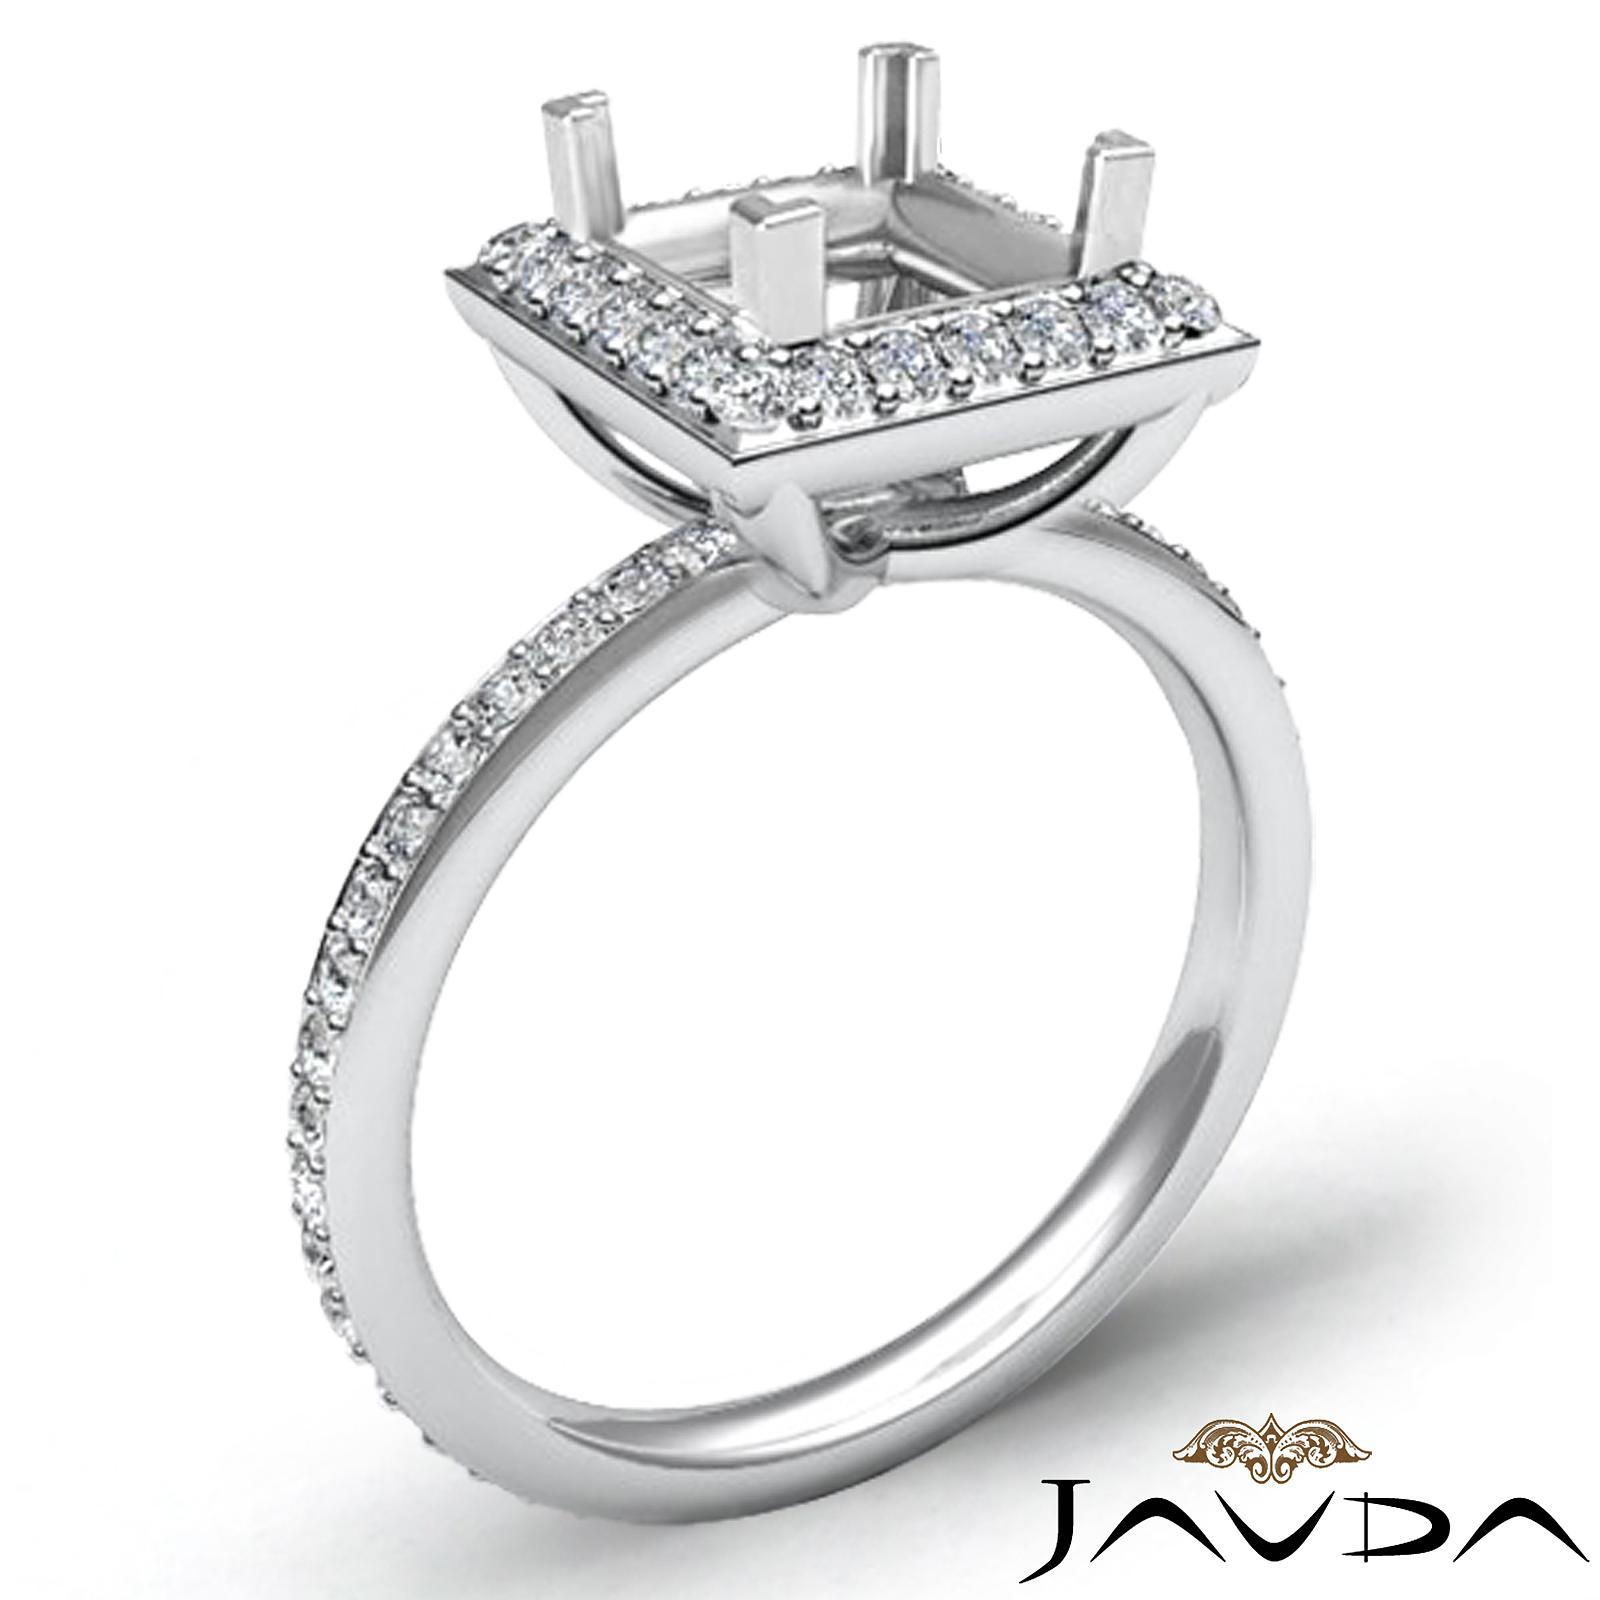 Diamond Engagement Ring Princess Cut Semi Mount Platinum Halo Setting 1Ct tw